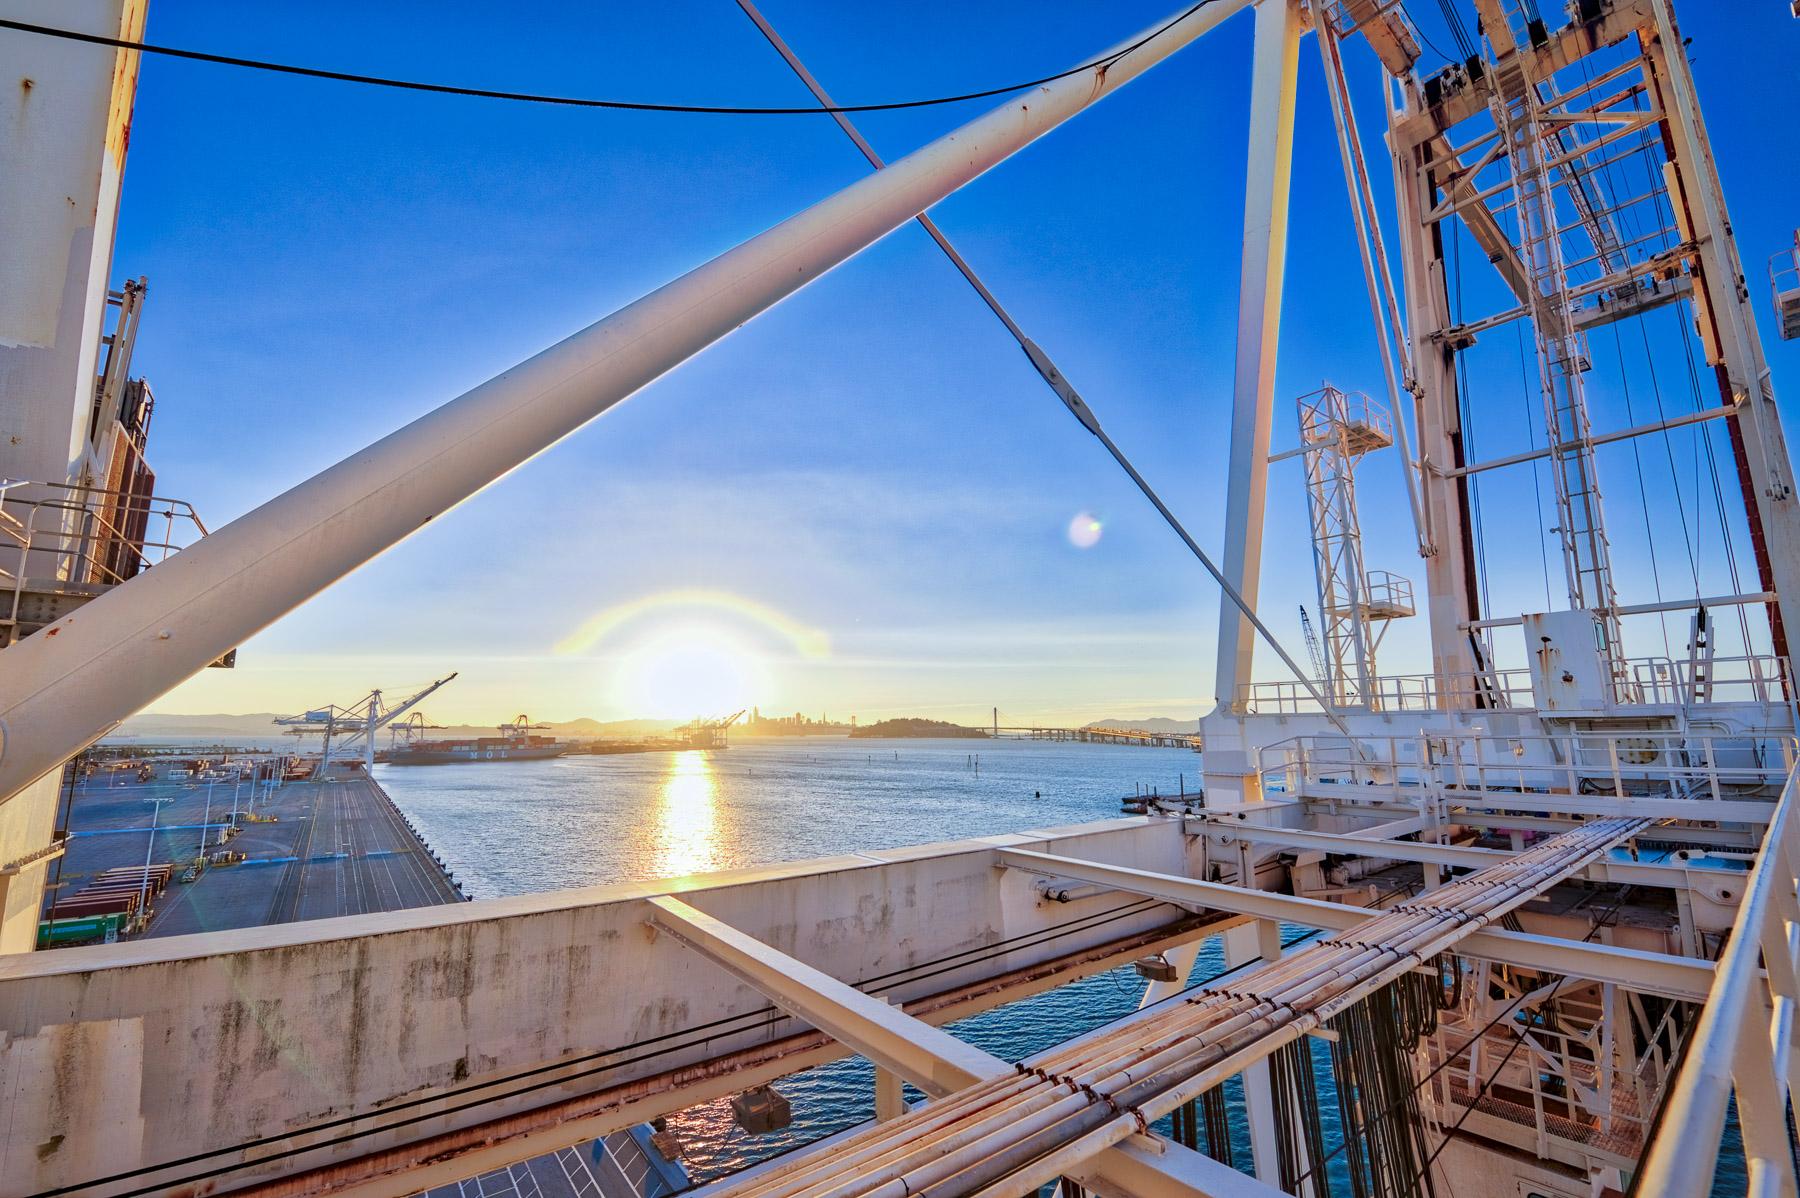 San Francisco Bay Area Industrial Shipping Port Crane Sunset City - Niall David Photography-2454